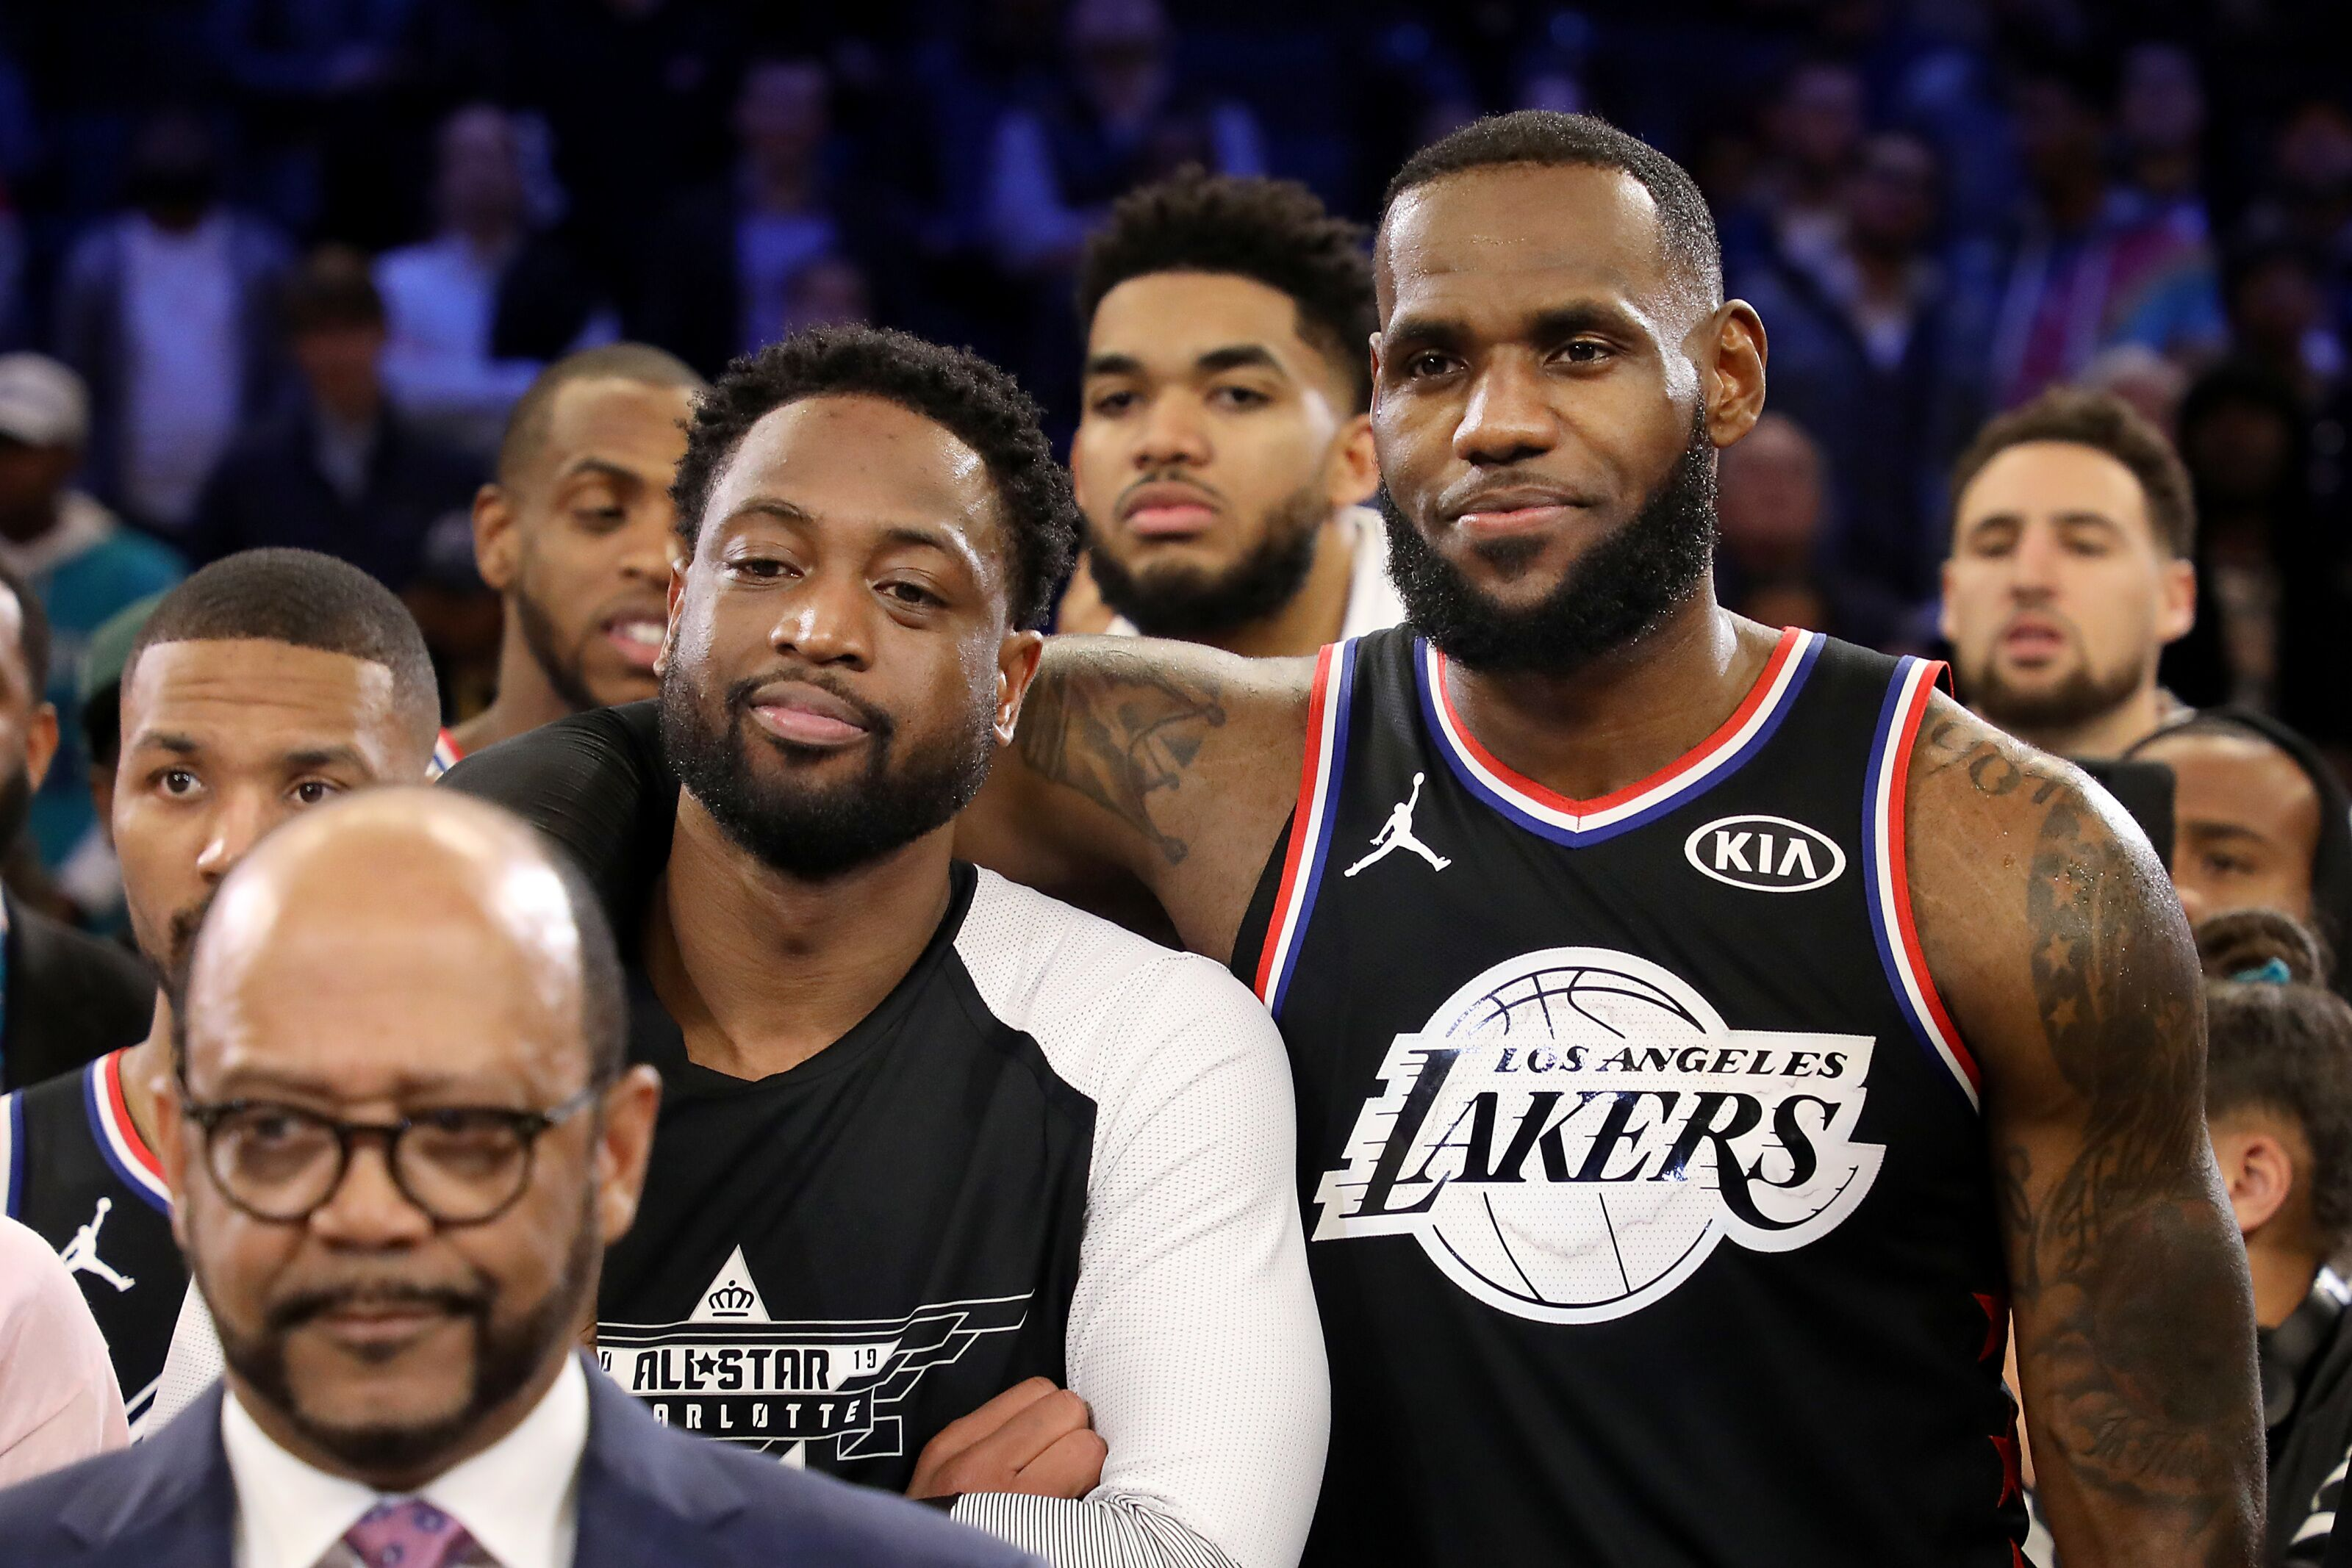 b585c5e34 Miami Heat among betting favorites to land LeBron James via trade